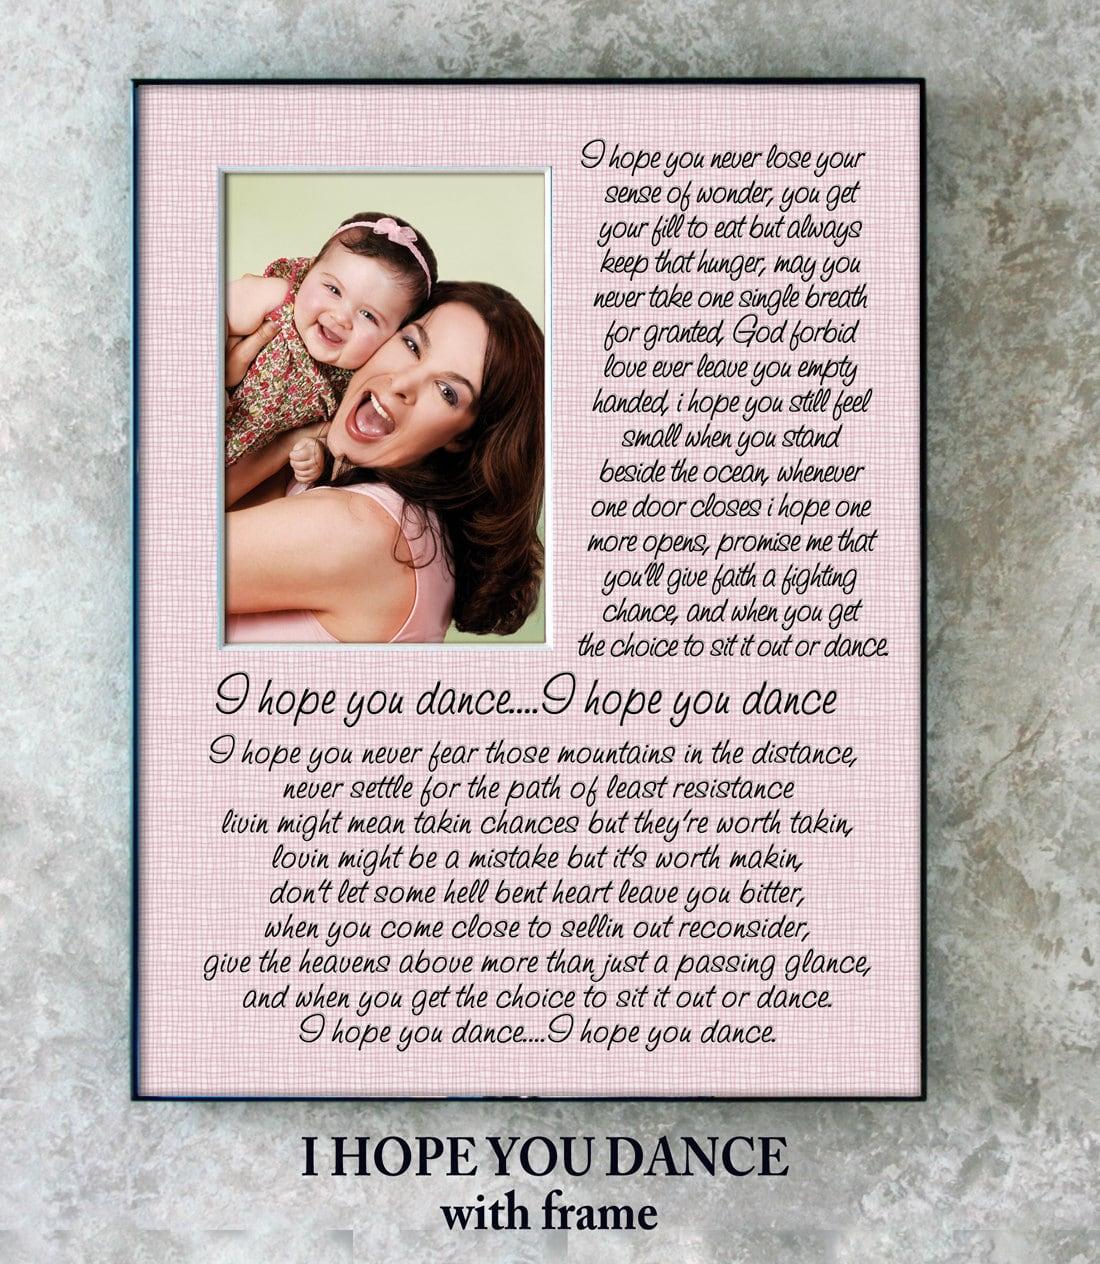 I Hope You Dance Song Lyrics 11x14 Photo Mat By Fancythisphoto